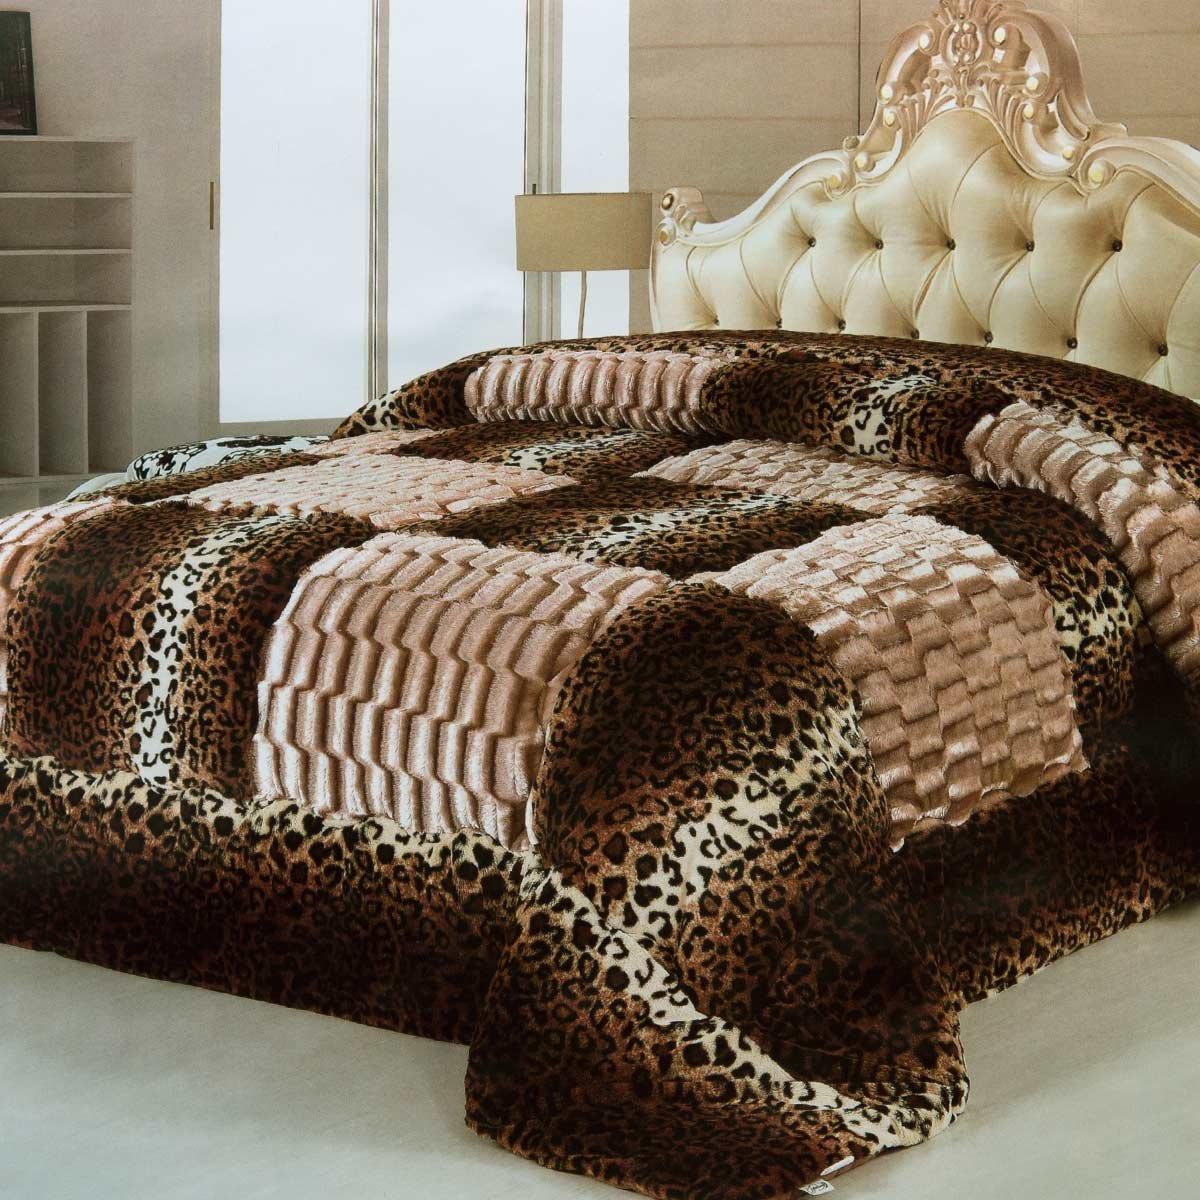 Trapunta piumone invernale matrimoniale leopardato ecopelliccia ...